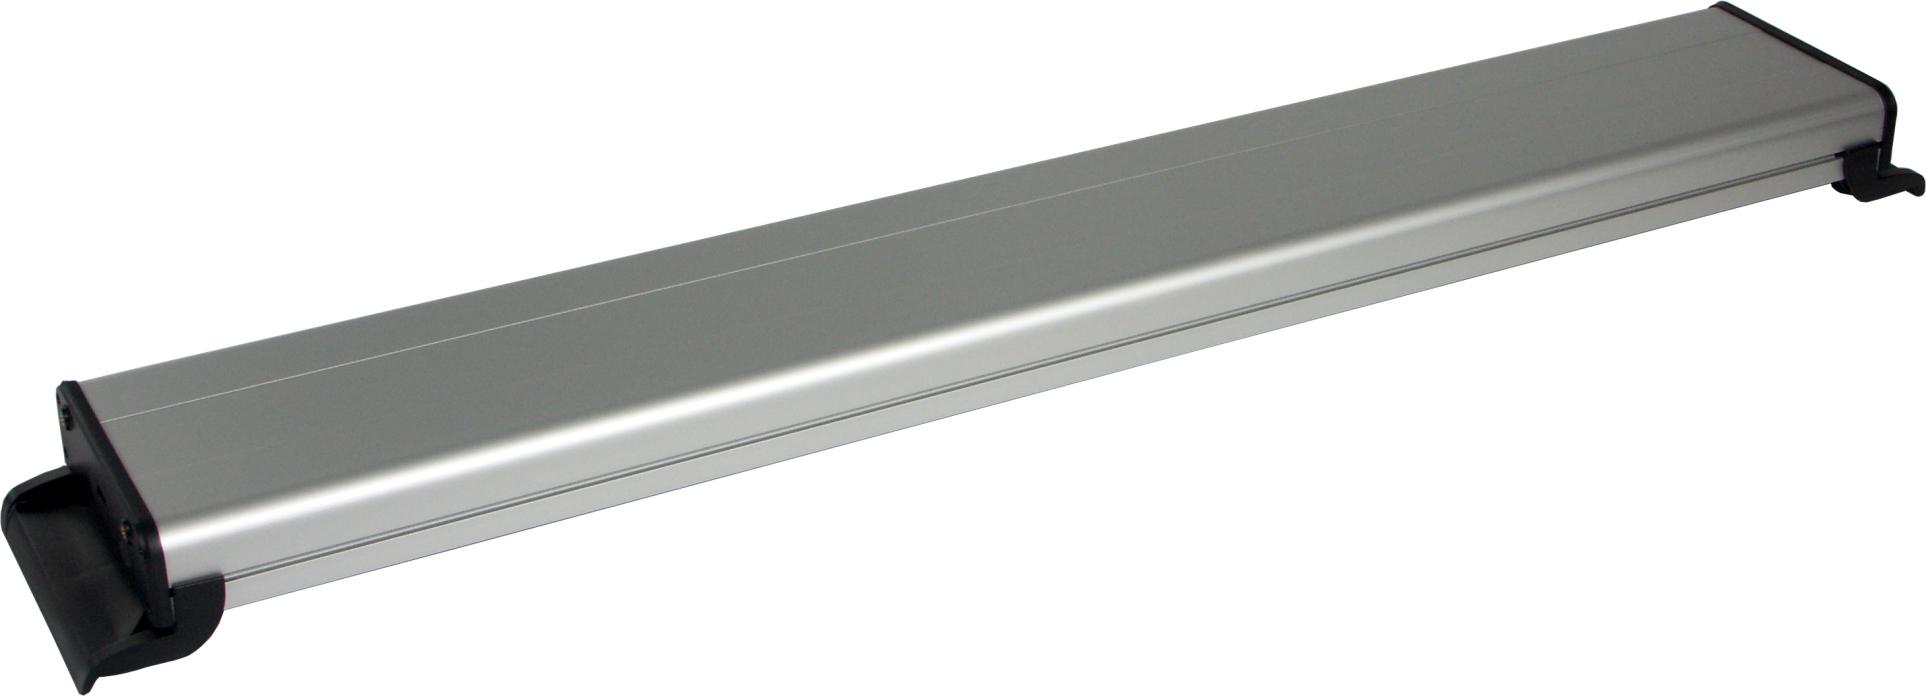 Preise sera LED fixture 1200